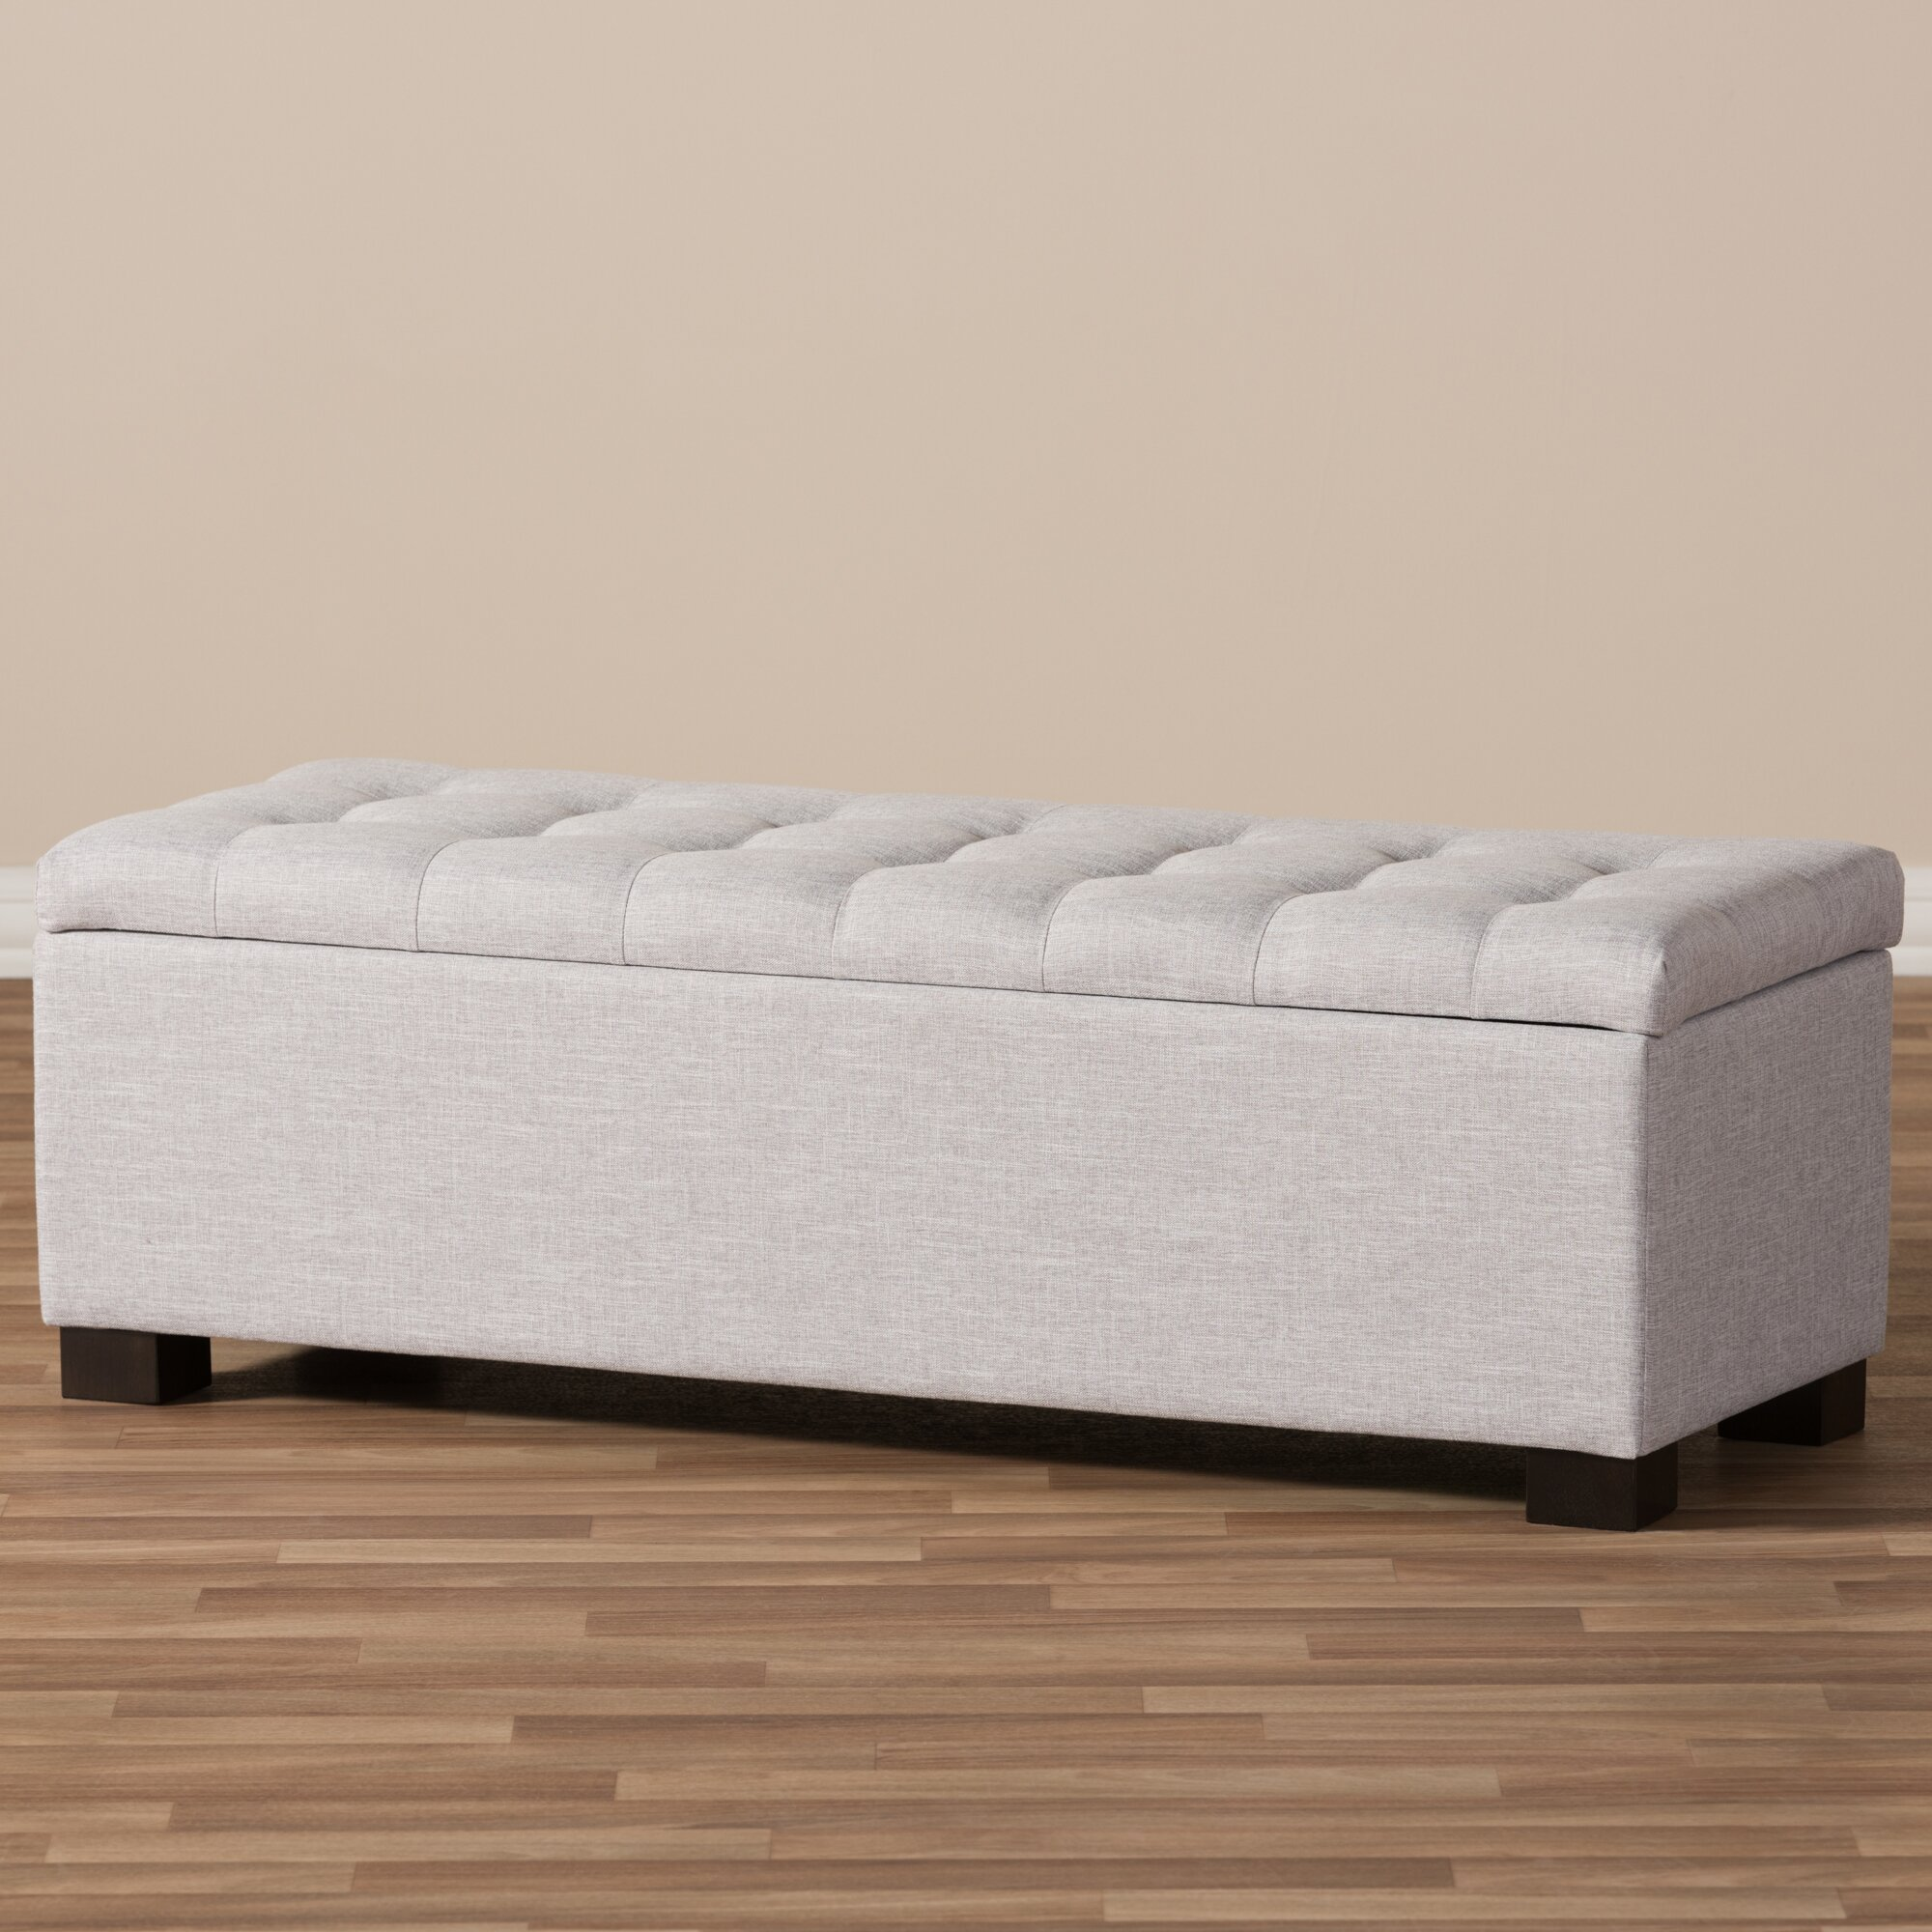 Latitude Run Kareem Upholstered Storage Bedroom Bench Reviews Wayfair